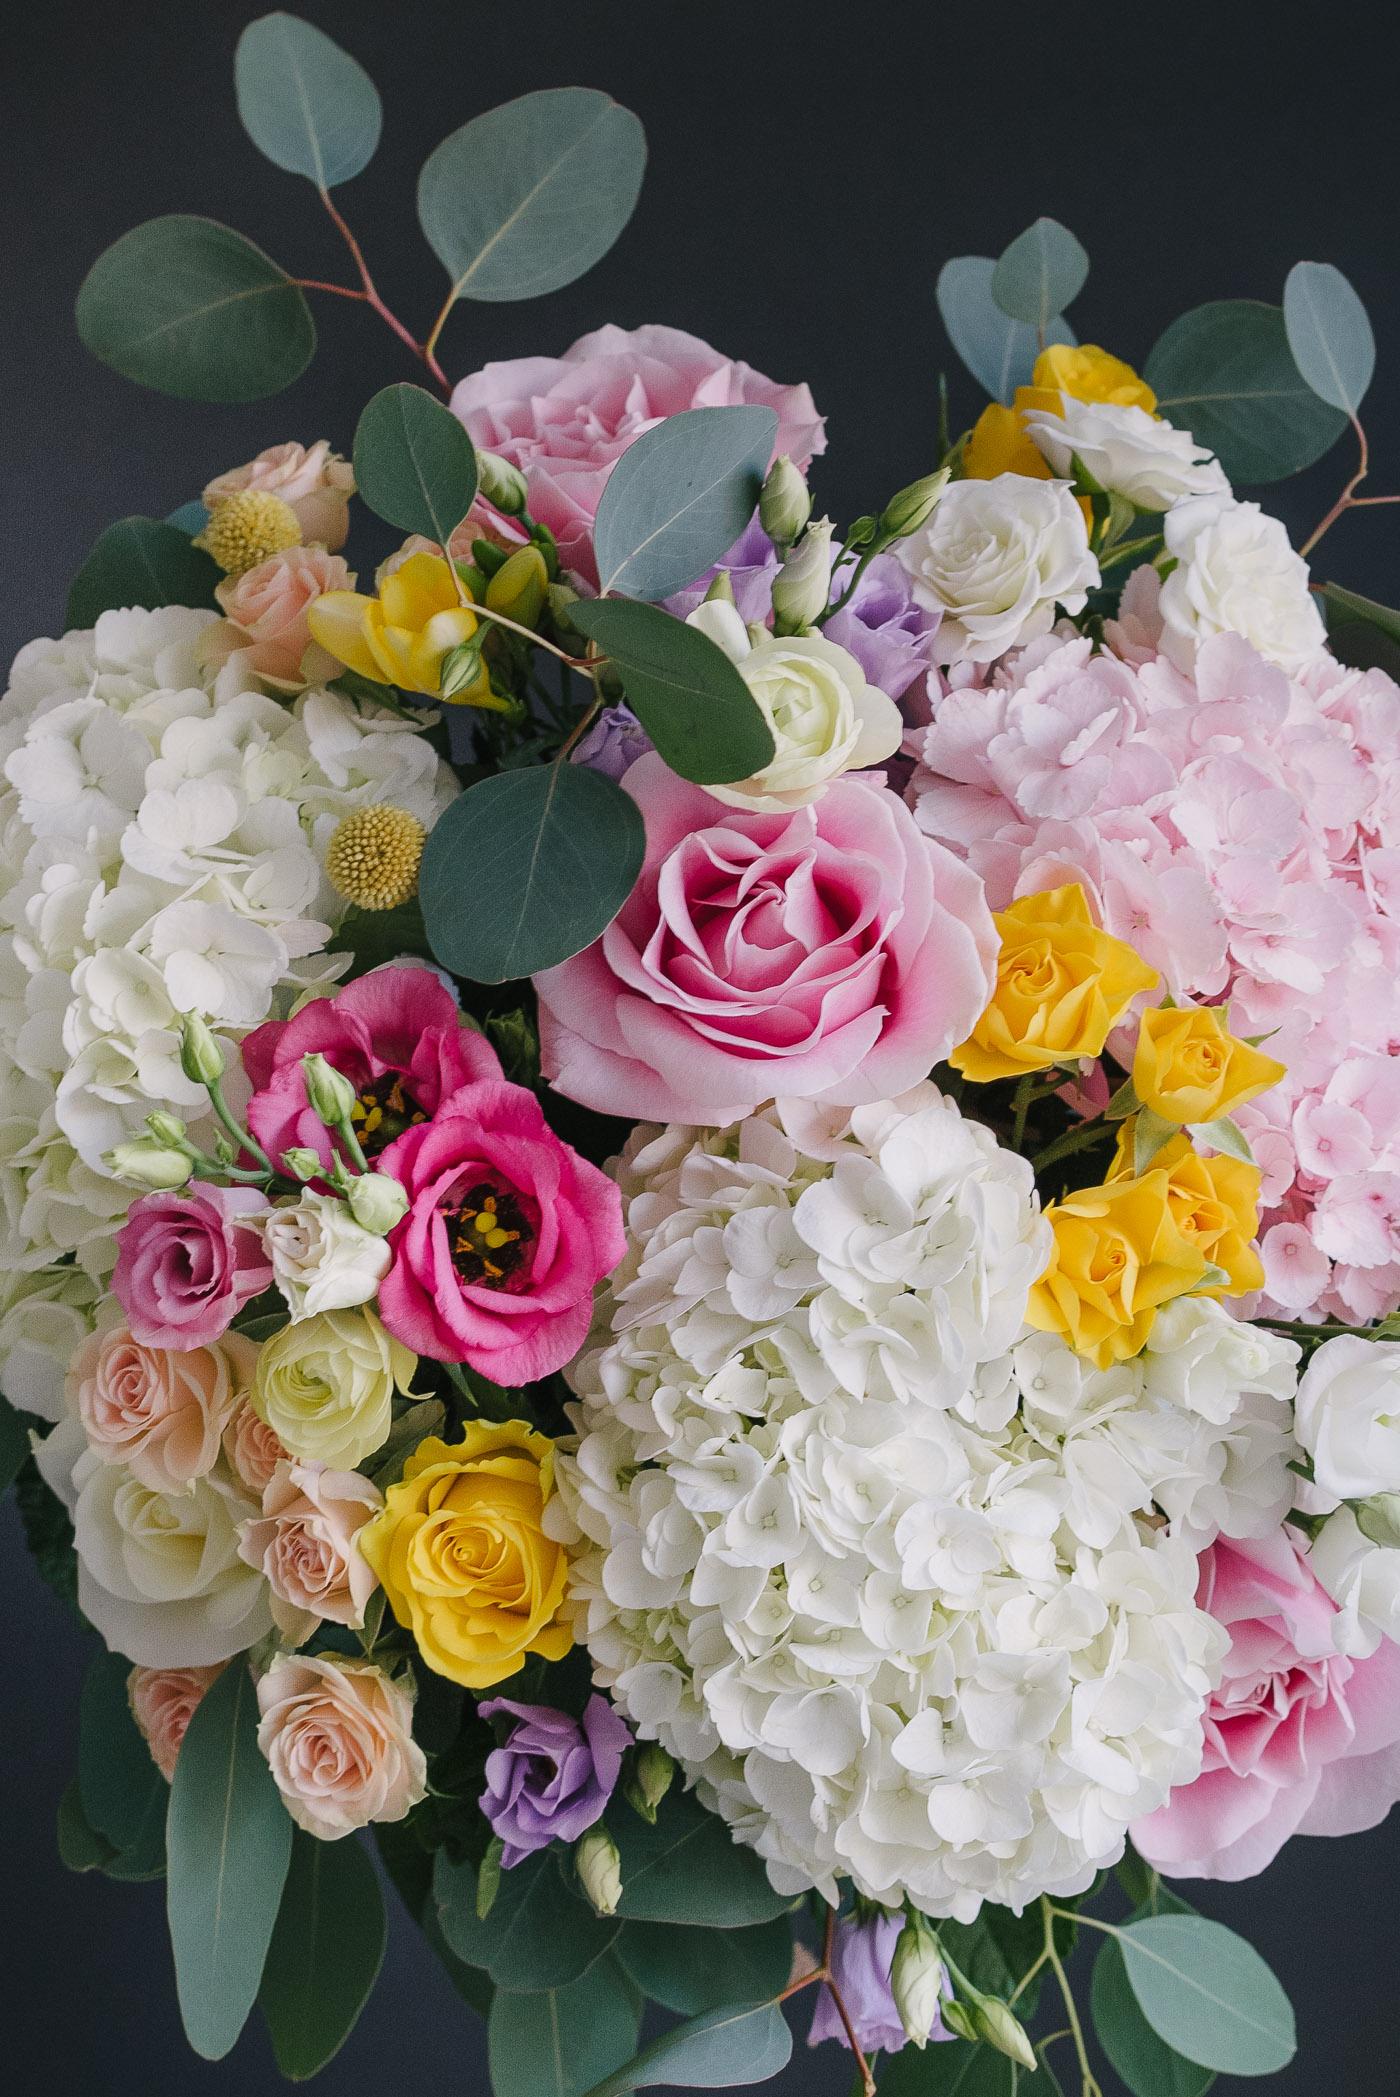 Buchet De Flori Mare Colorat